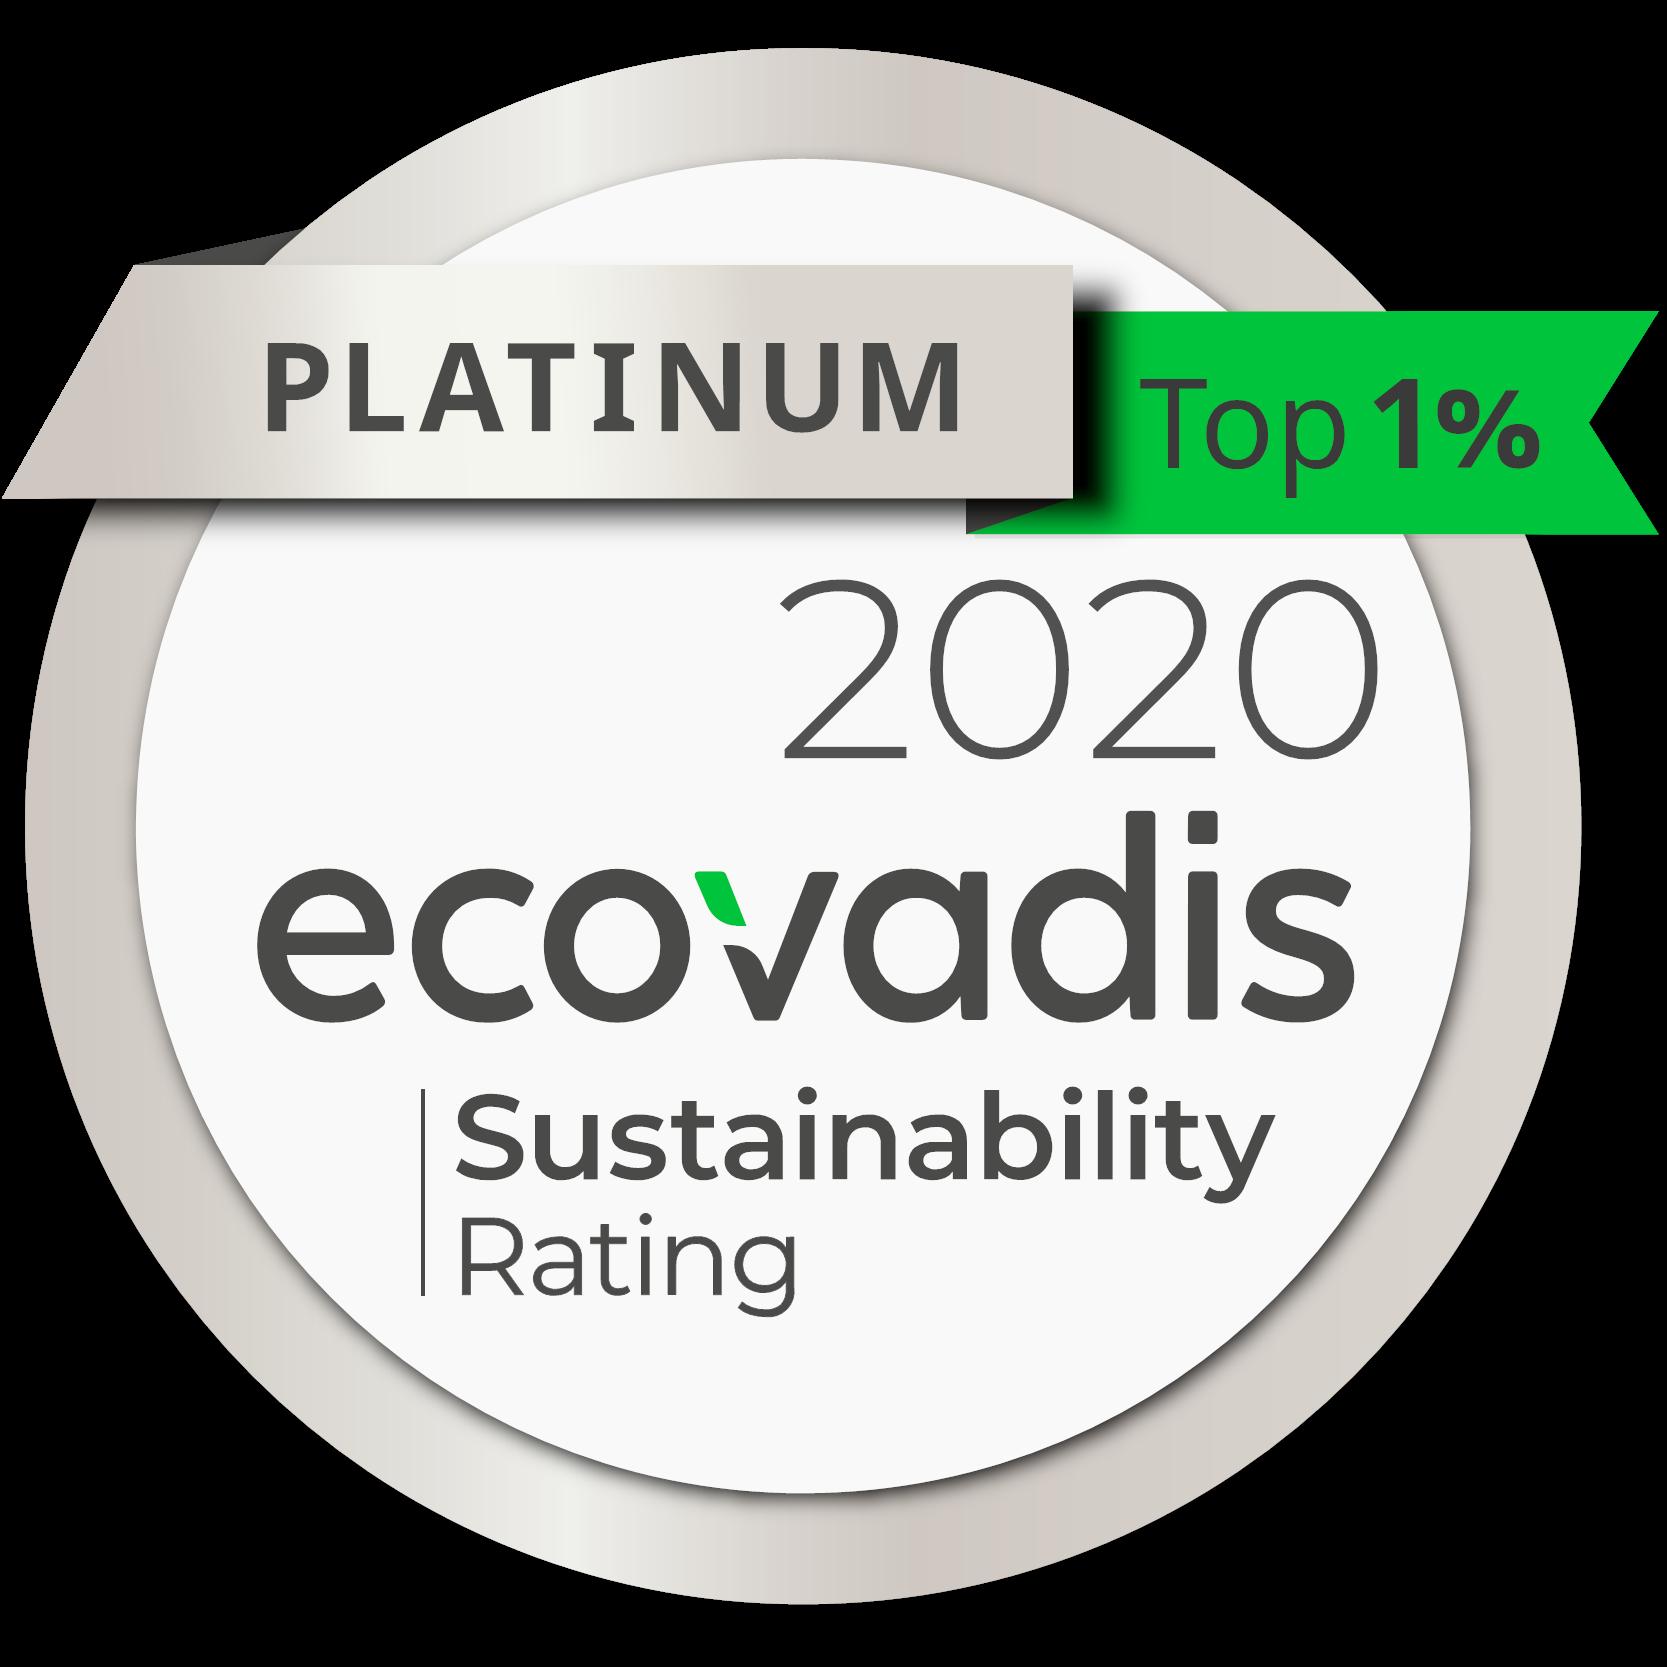 CSR sonego 2020 platinium top 1 Ecovadis